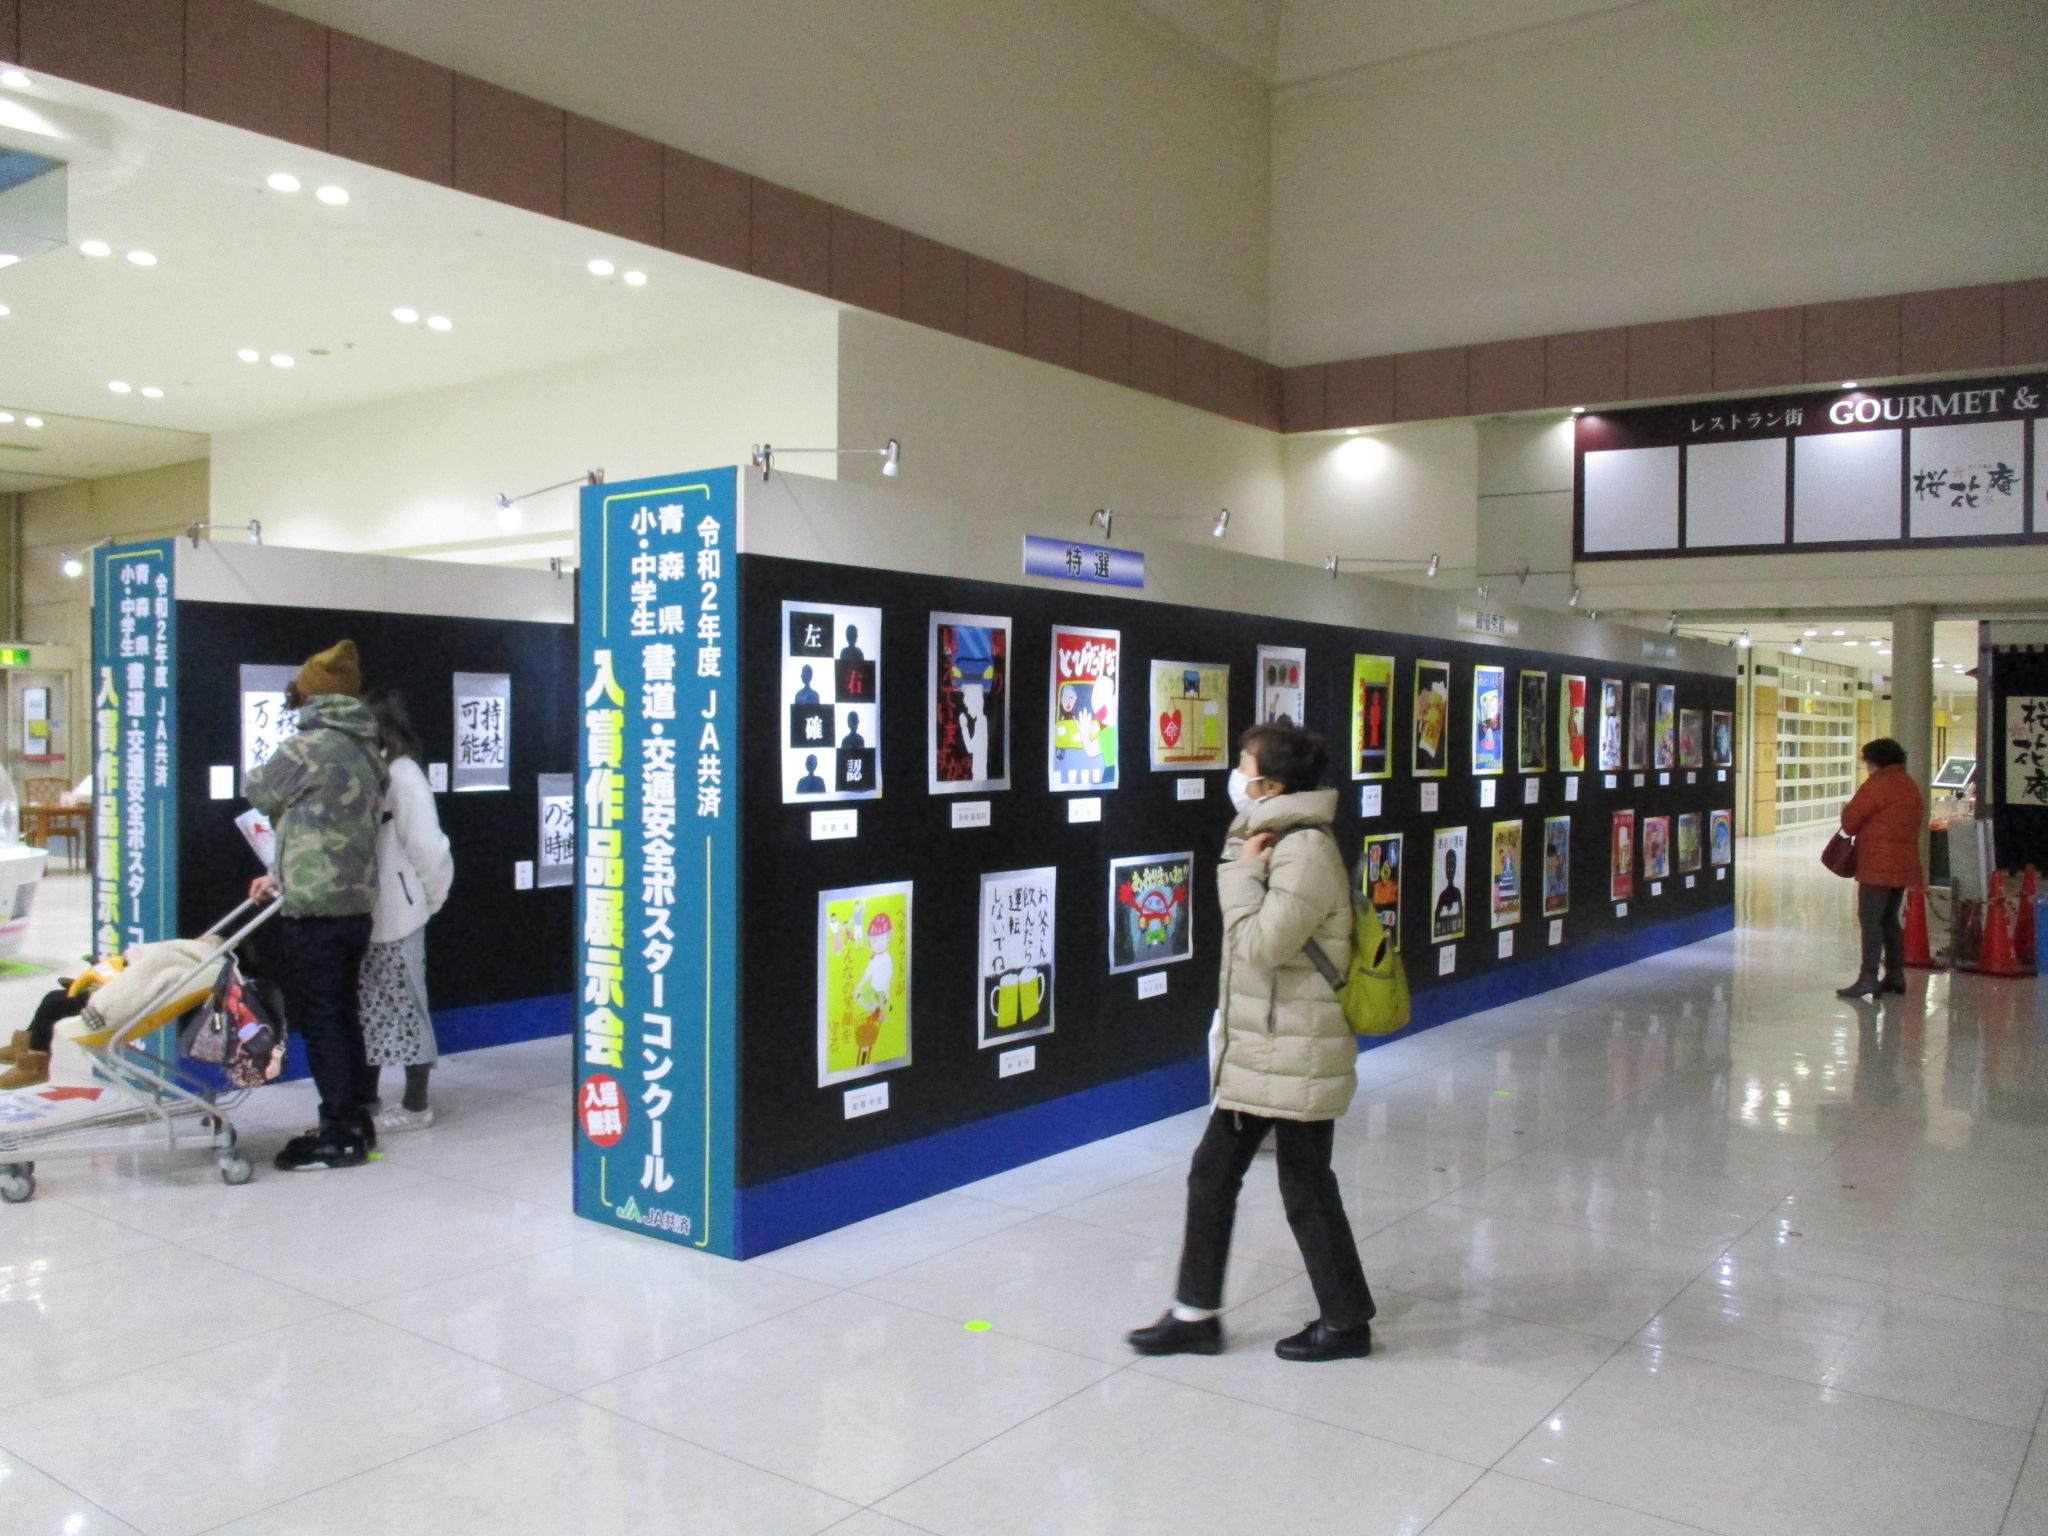 弘前市 展示会場の様子